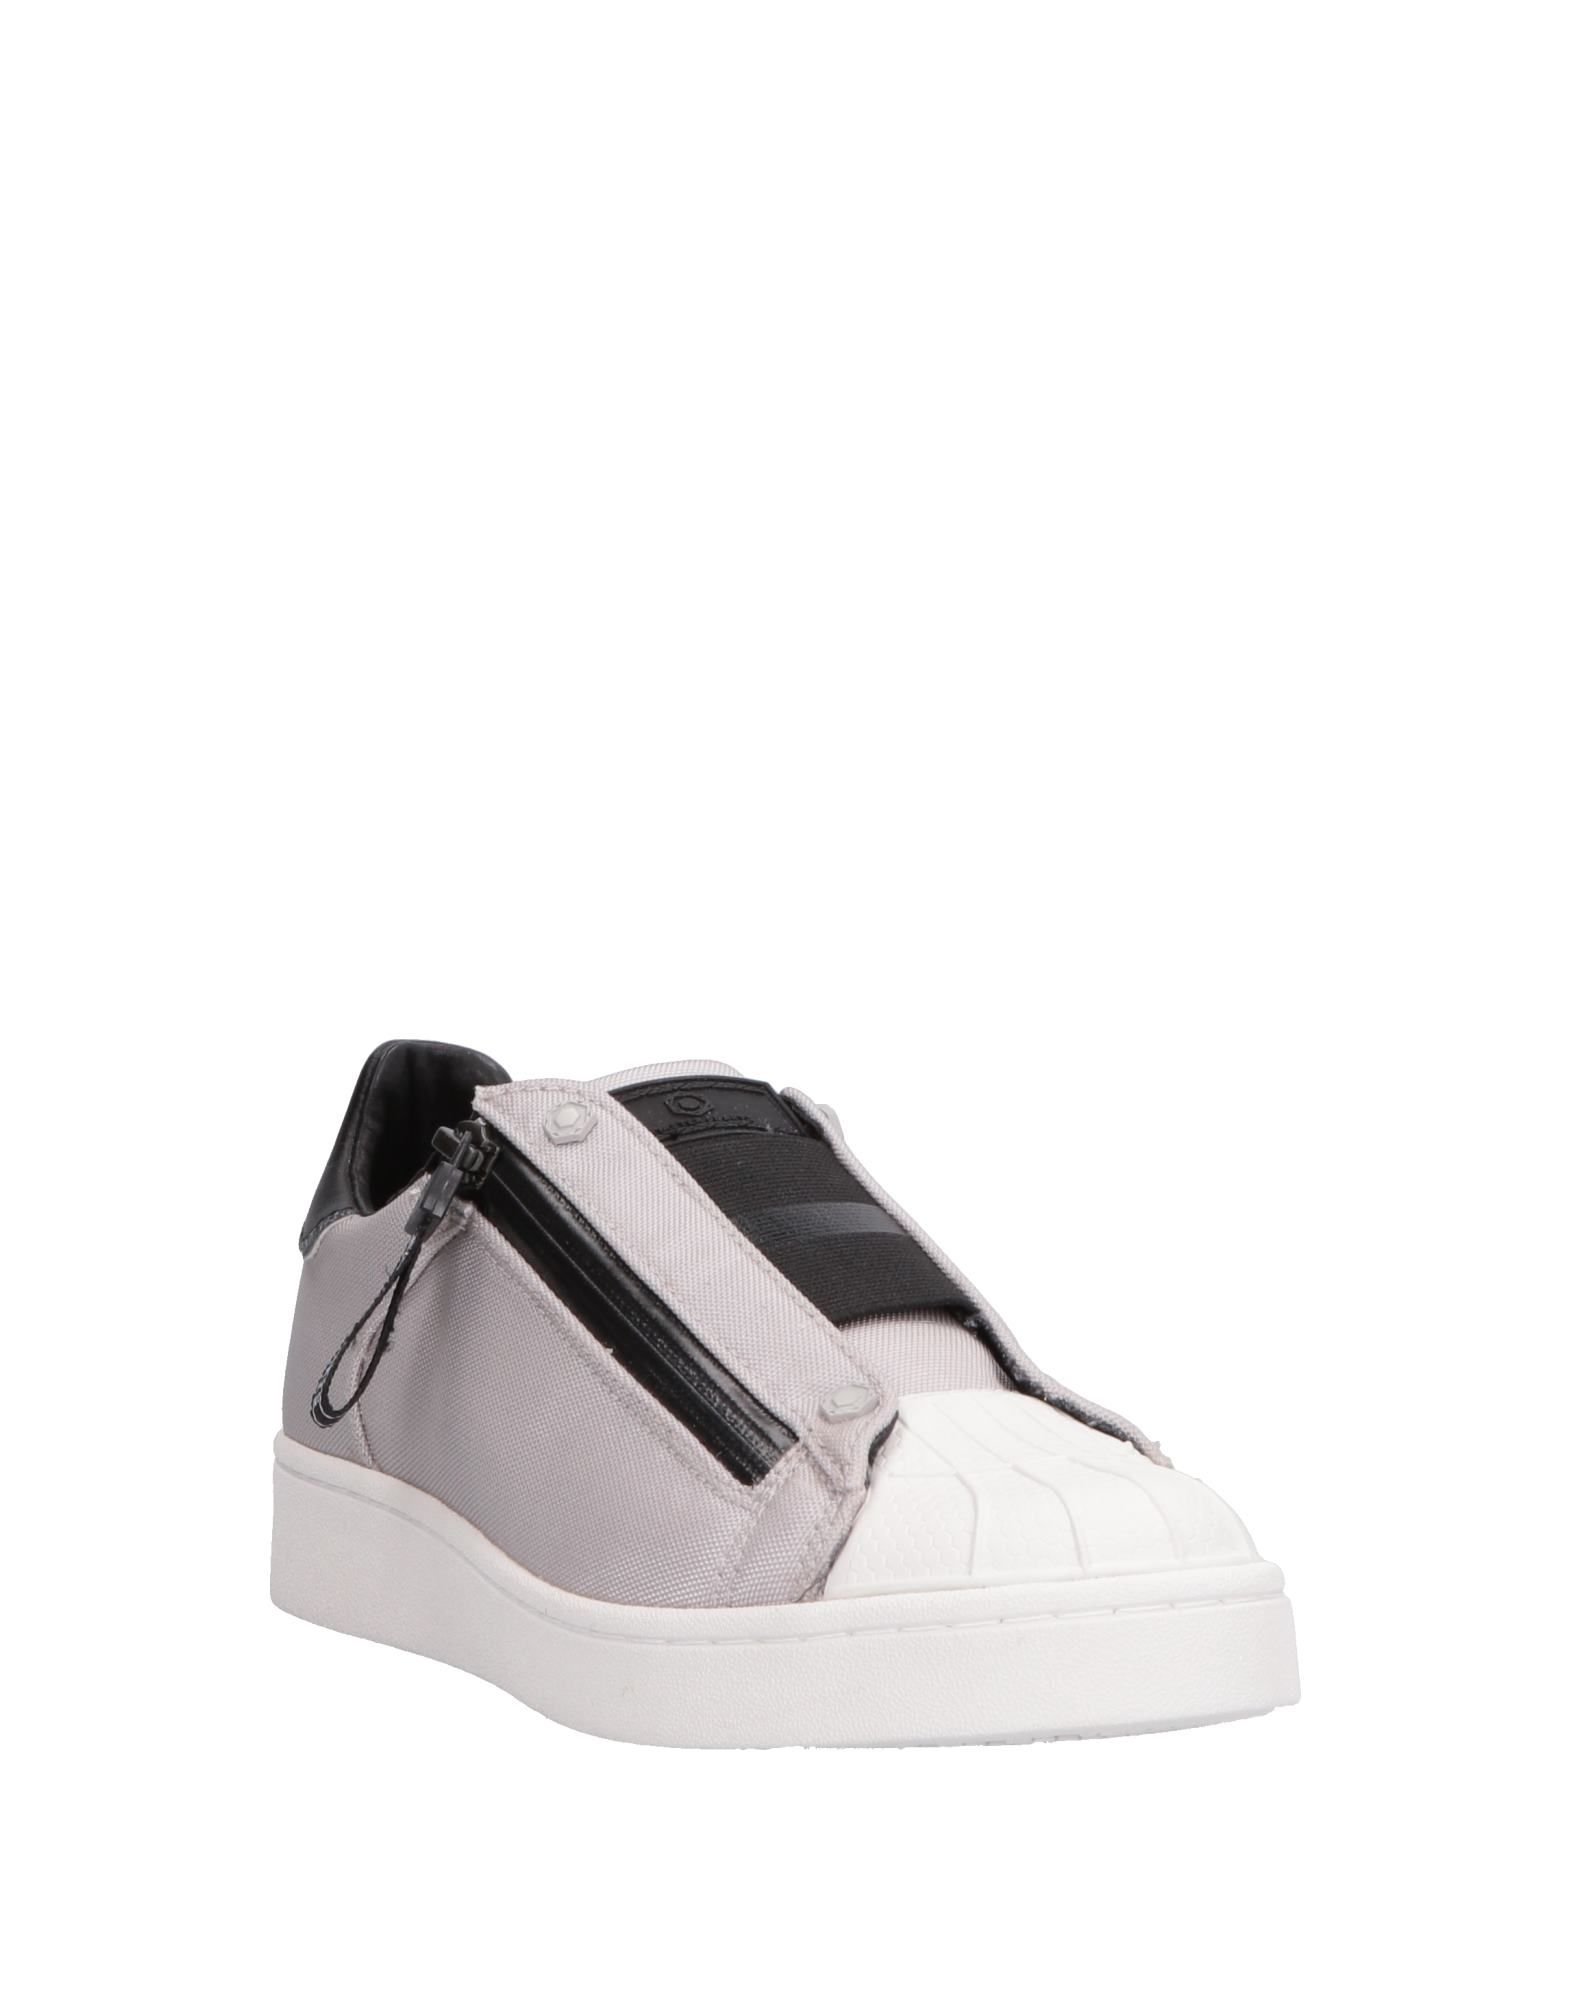 Stilvolle billige Schuhe 11580233XS Moa Master Of Arts Turnschuhes Damen 11580233XS Schuhe 64b92b